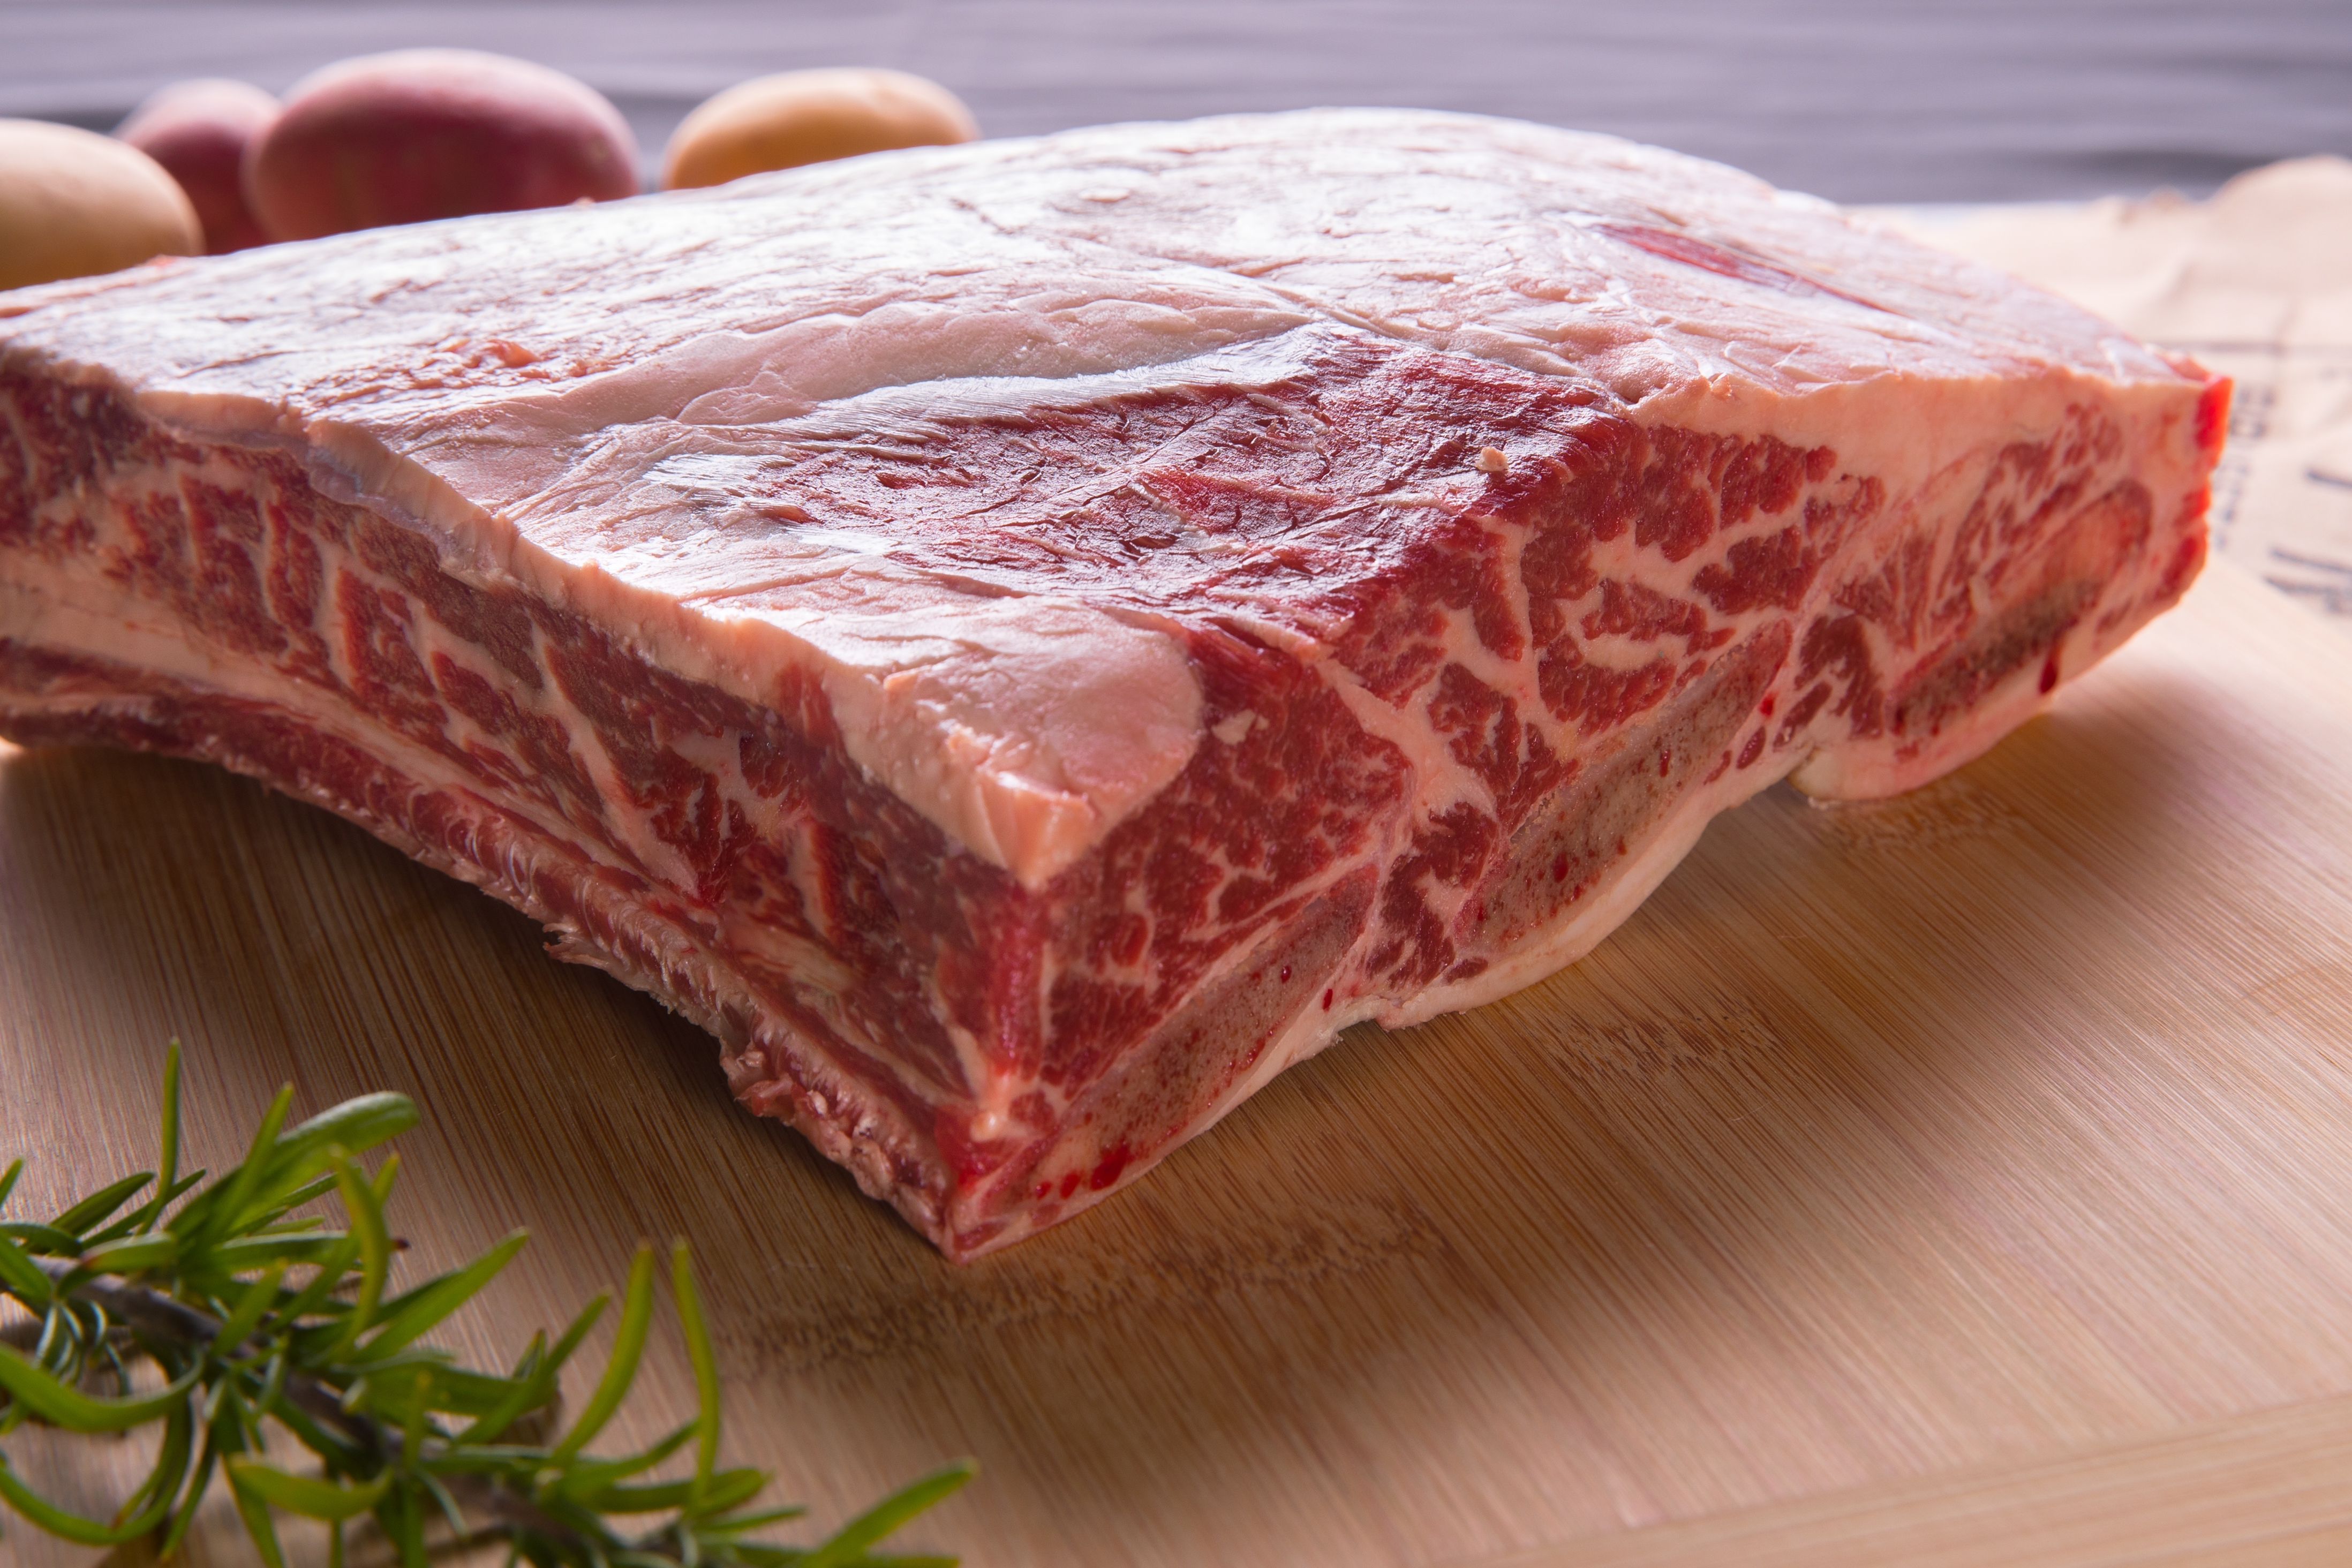 Brasstown Beef - Beef Short Ribs